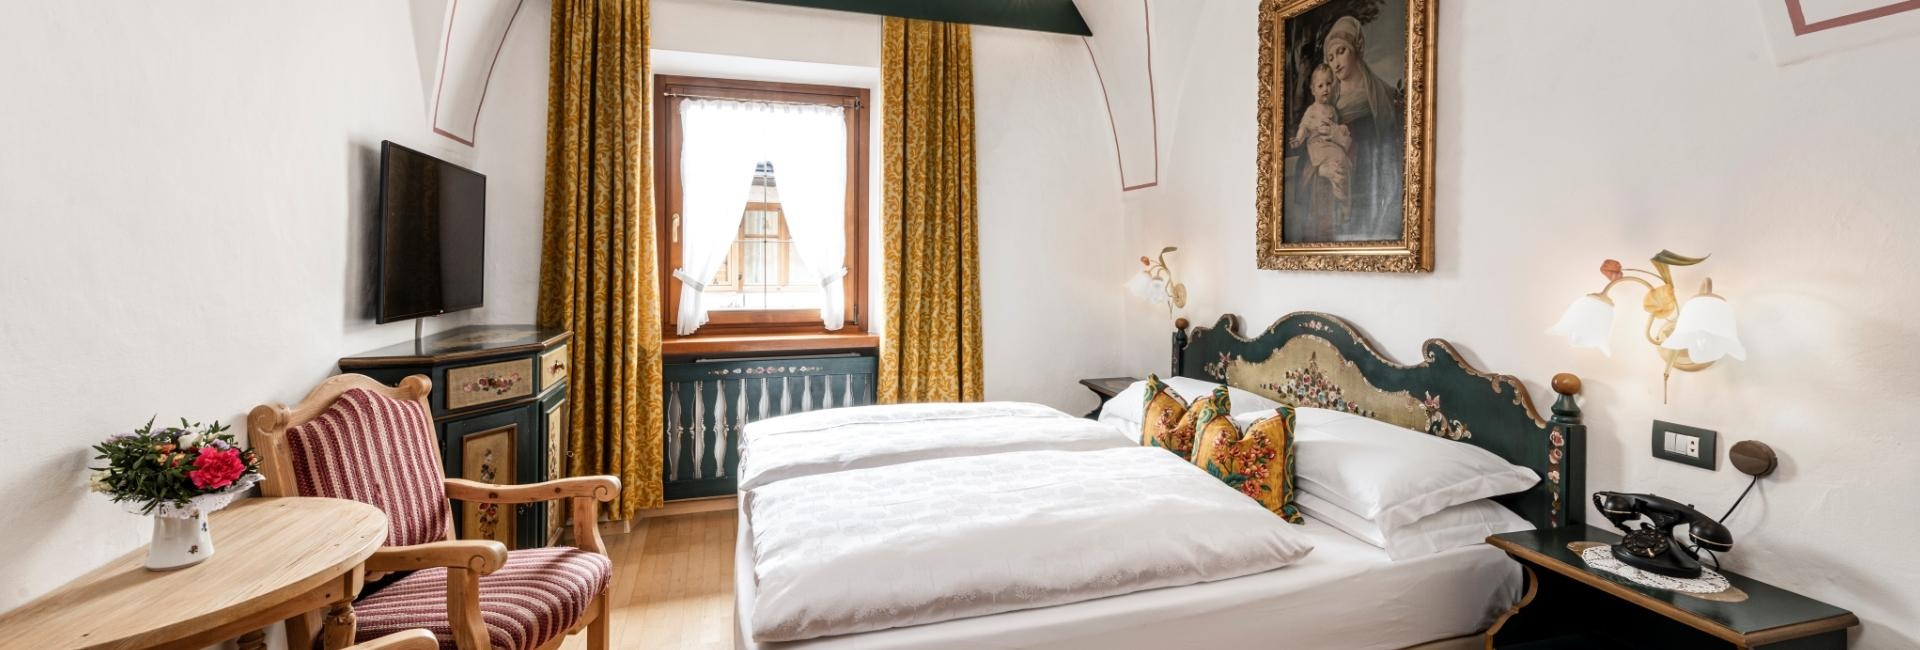 Hotel Cavallino d'Oro, Dolomites,